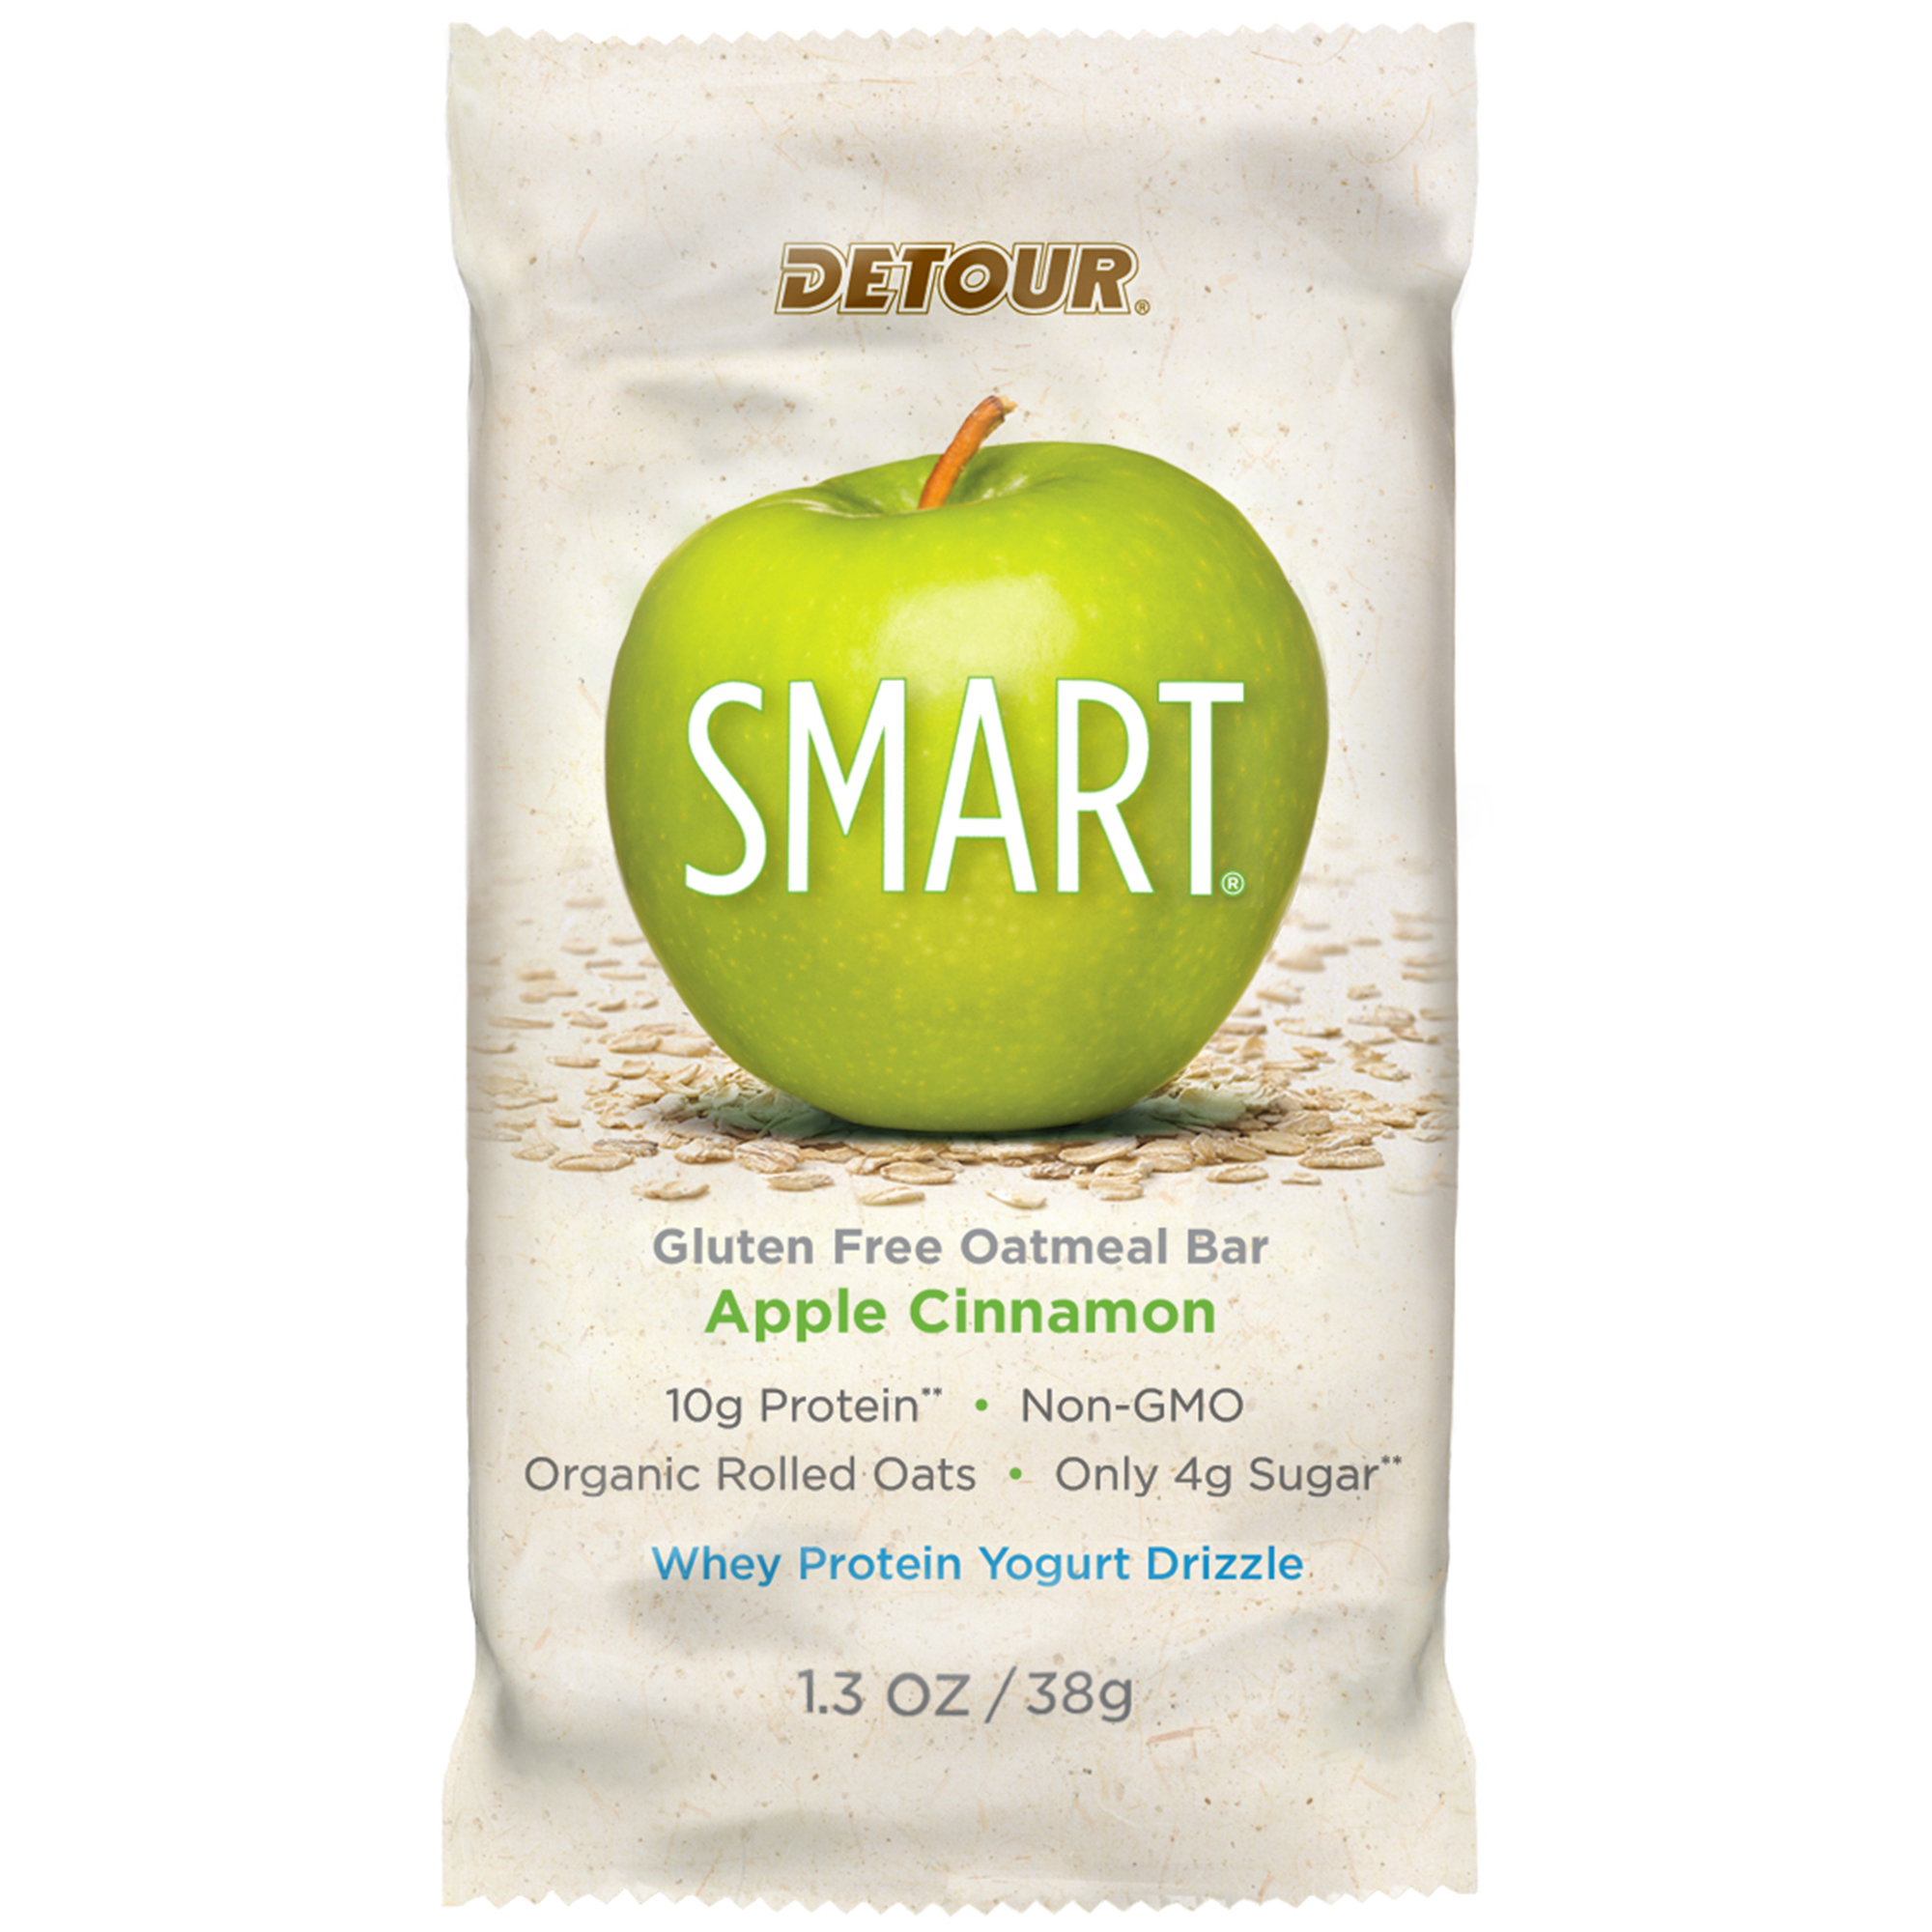 Detour SMART Cookie Dough Gluten Free Oatmeal Bar, 1.3 oz, 1 Count by Forward Foods LLC